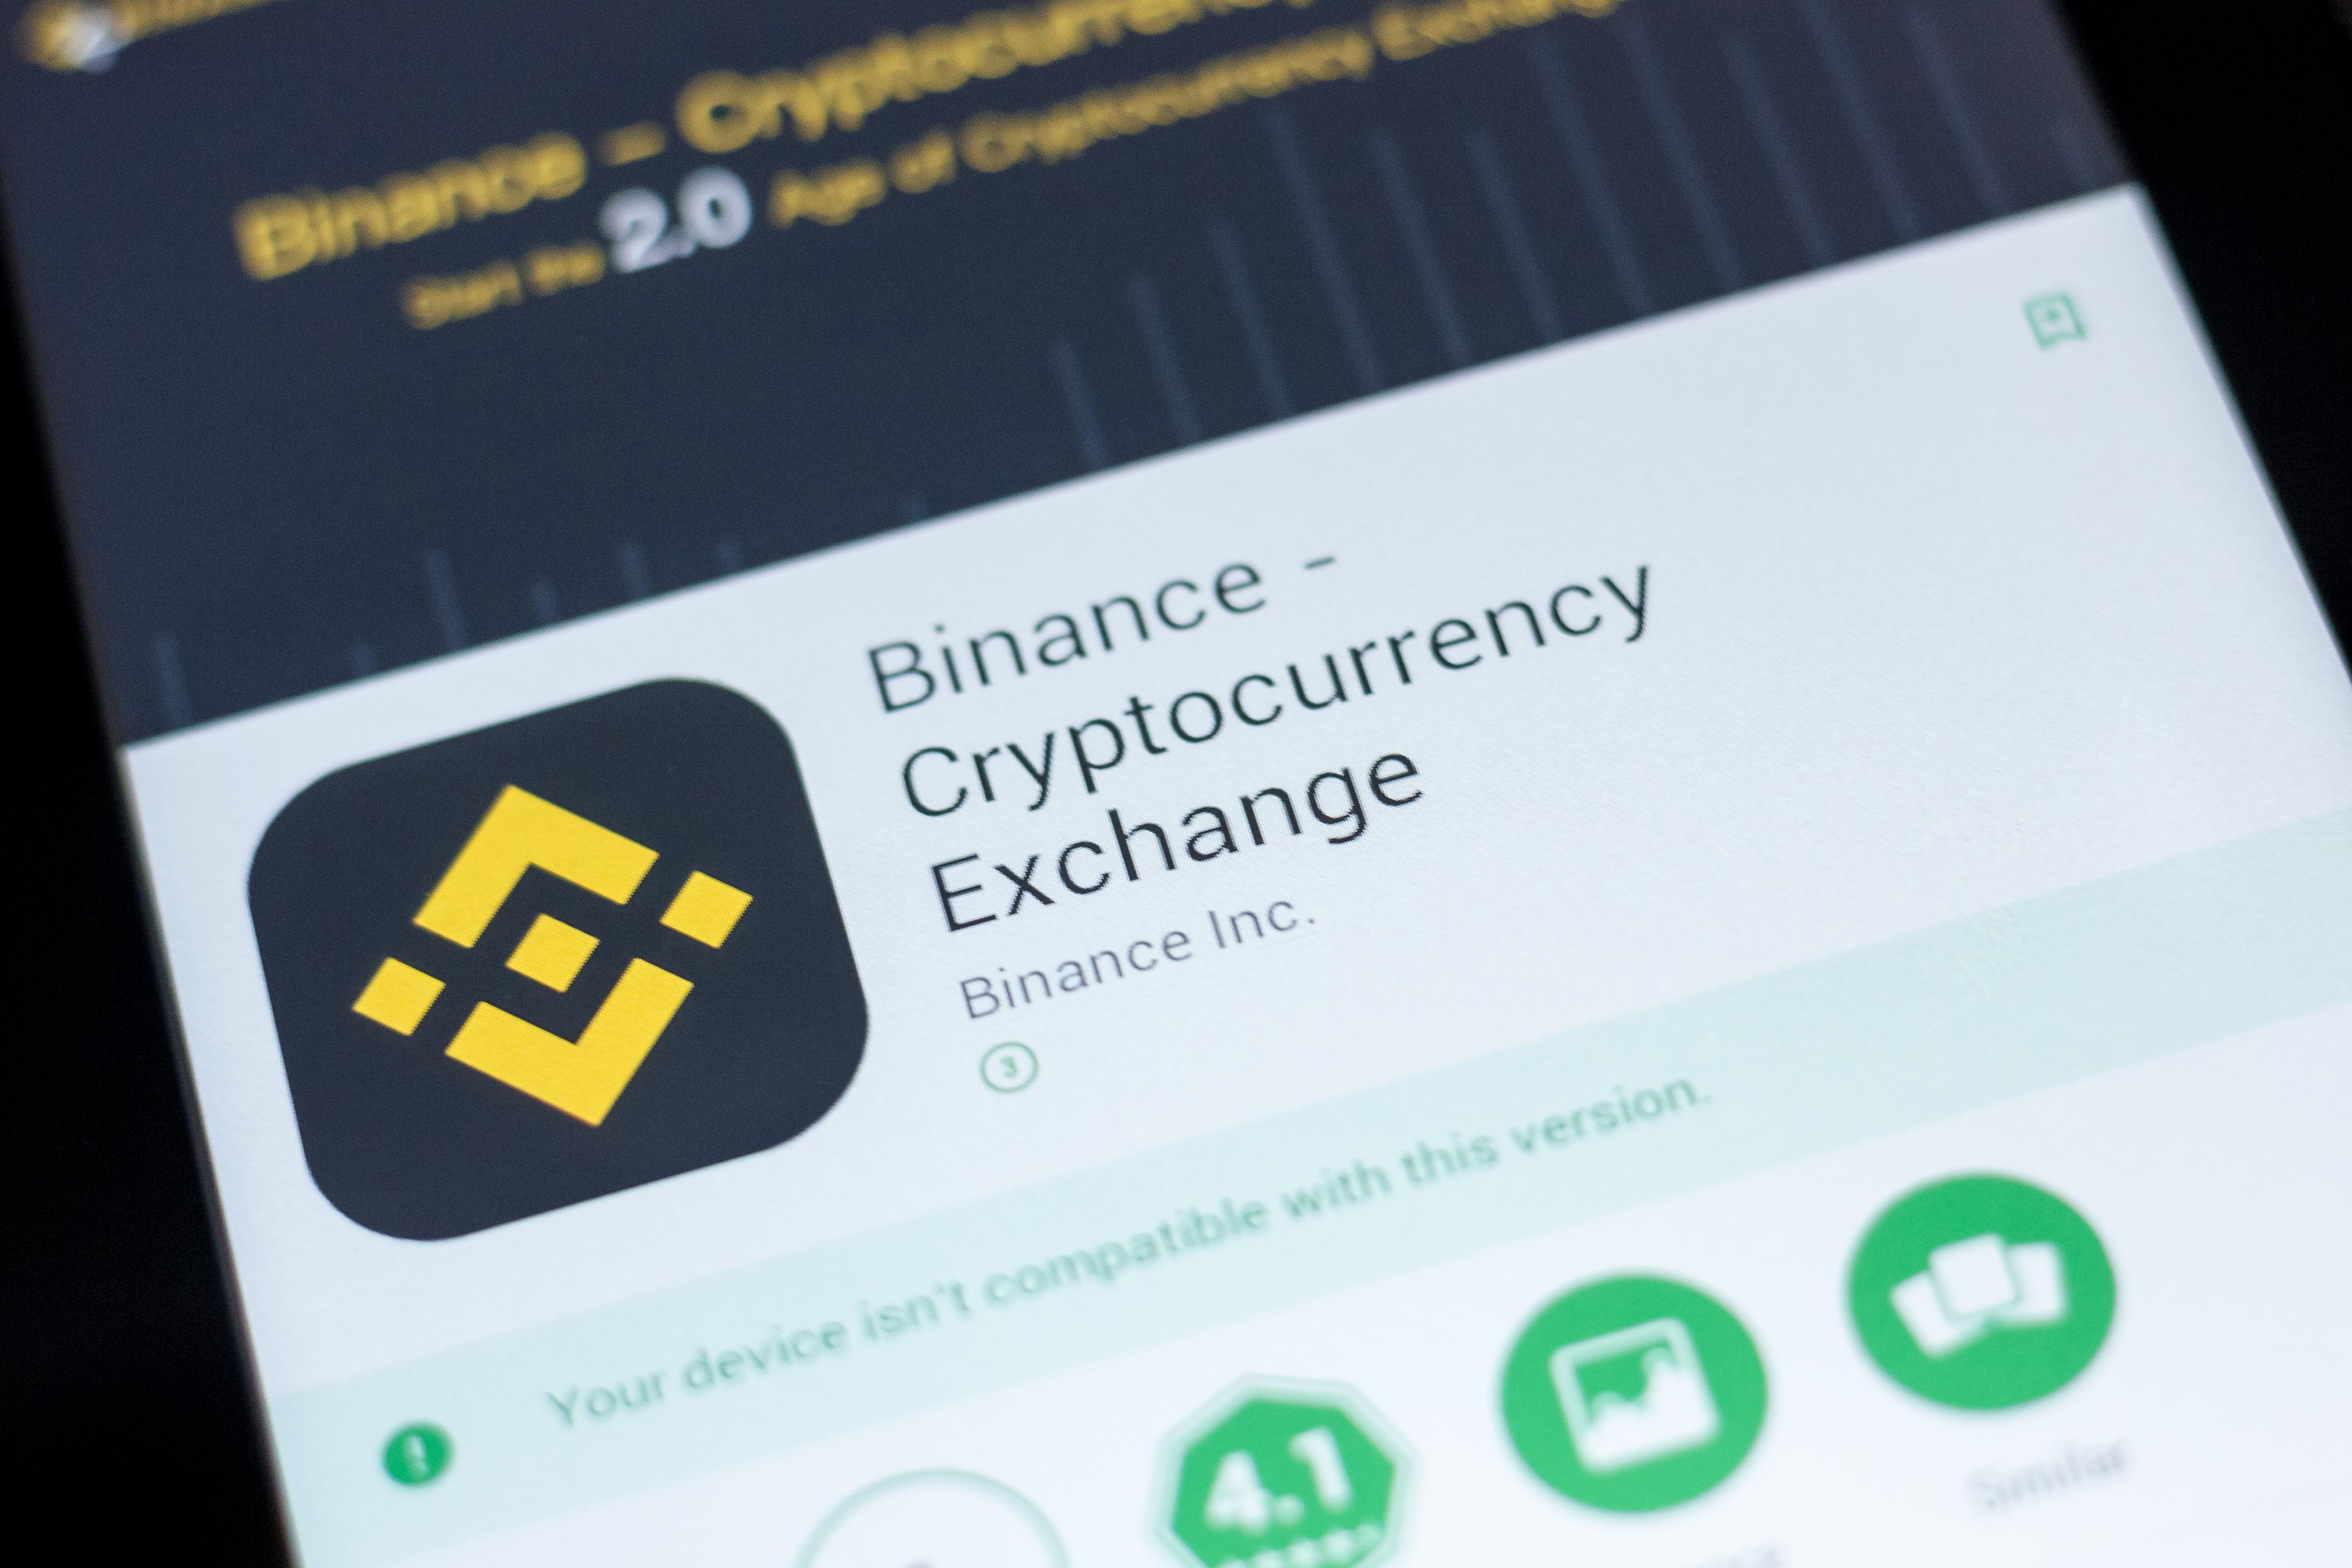 Binance Adds Usdc Trading Pairs Stellar And Ripple Represented